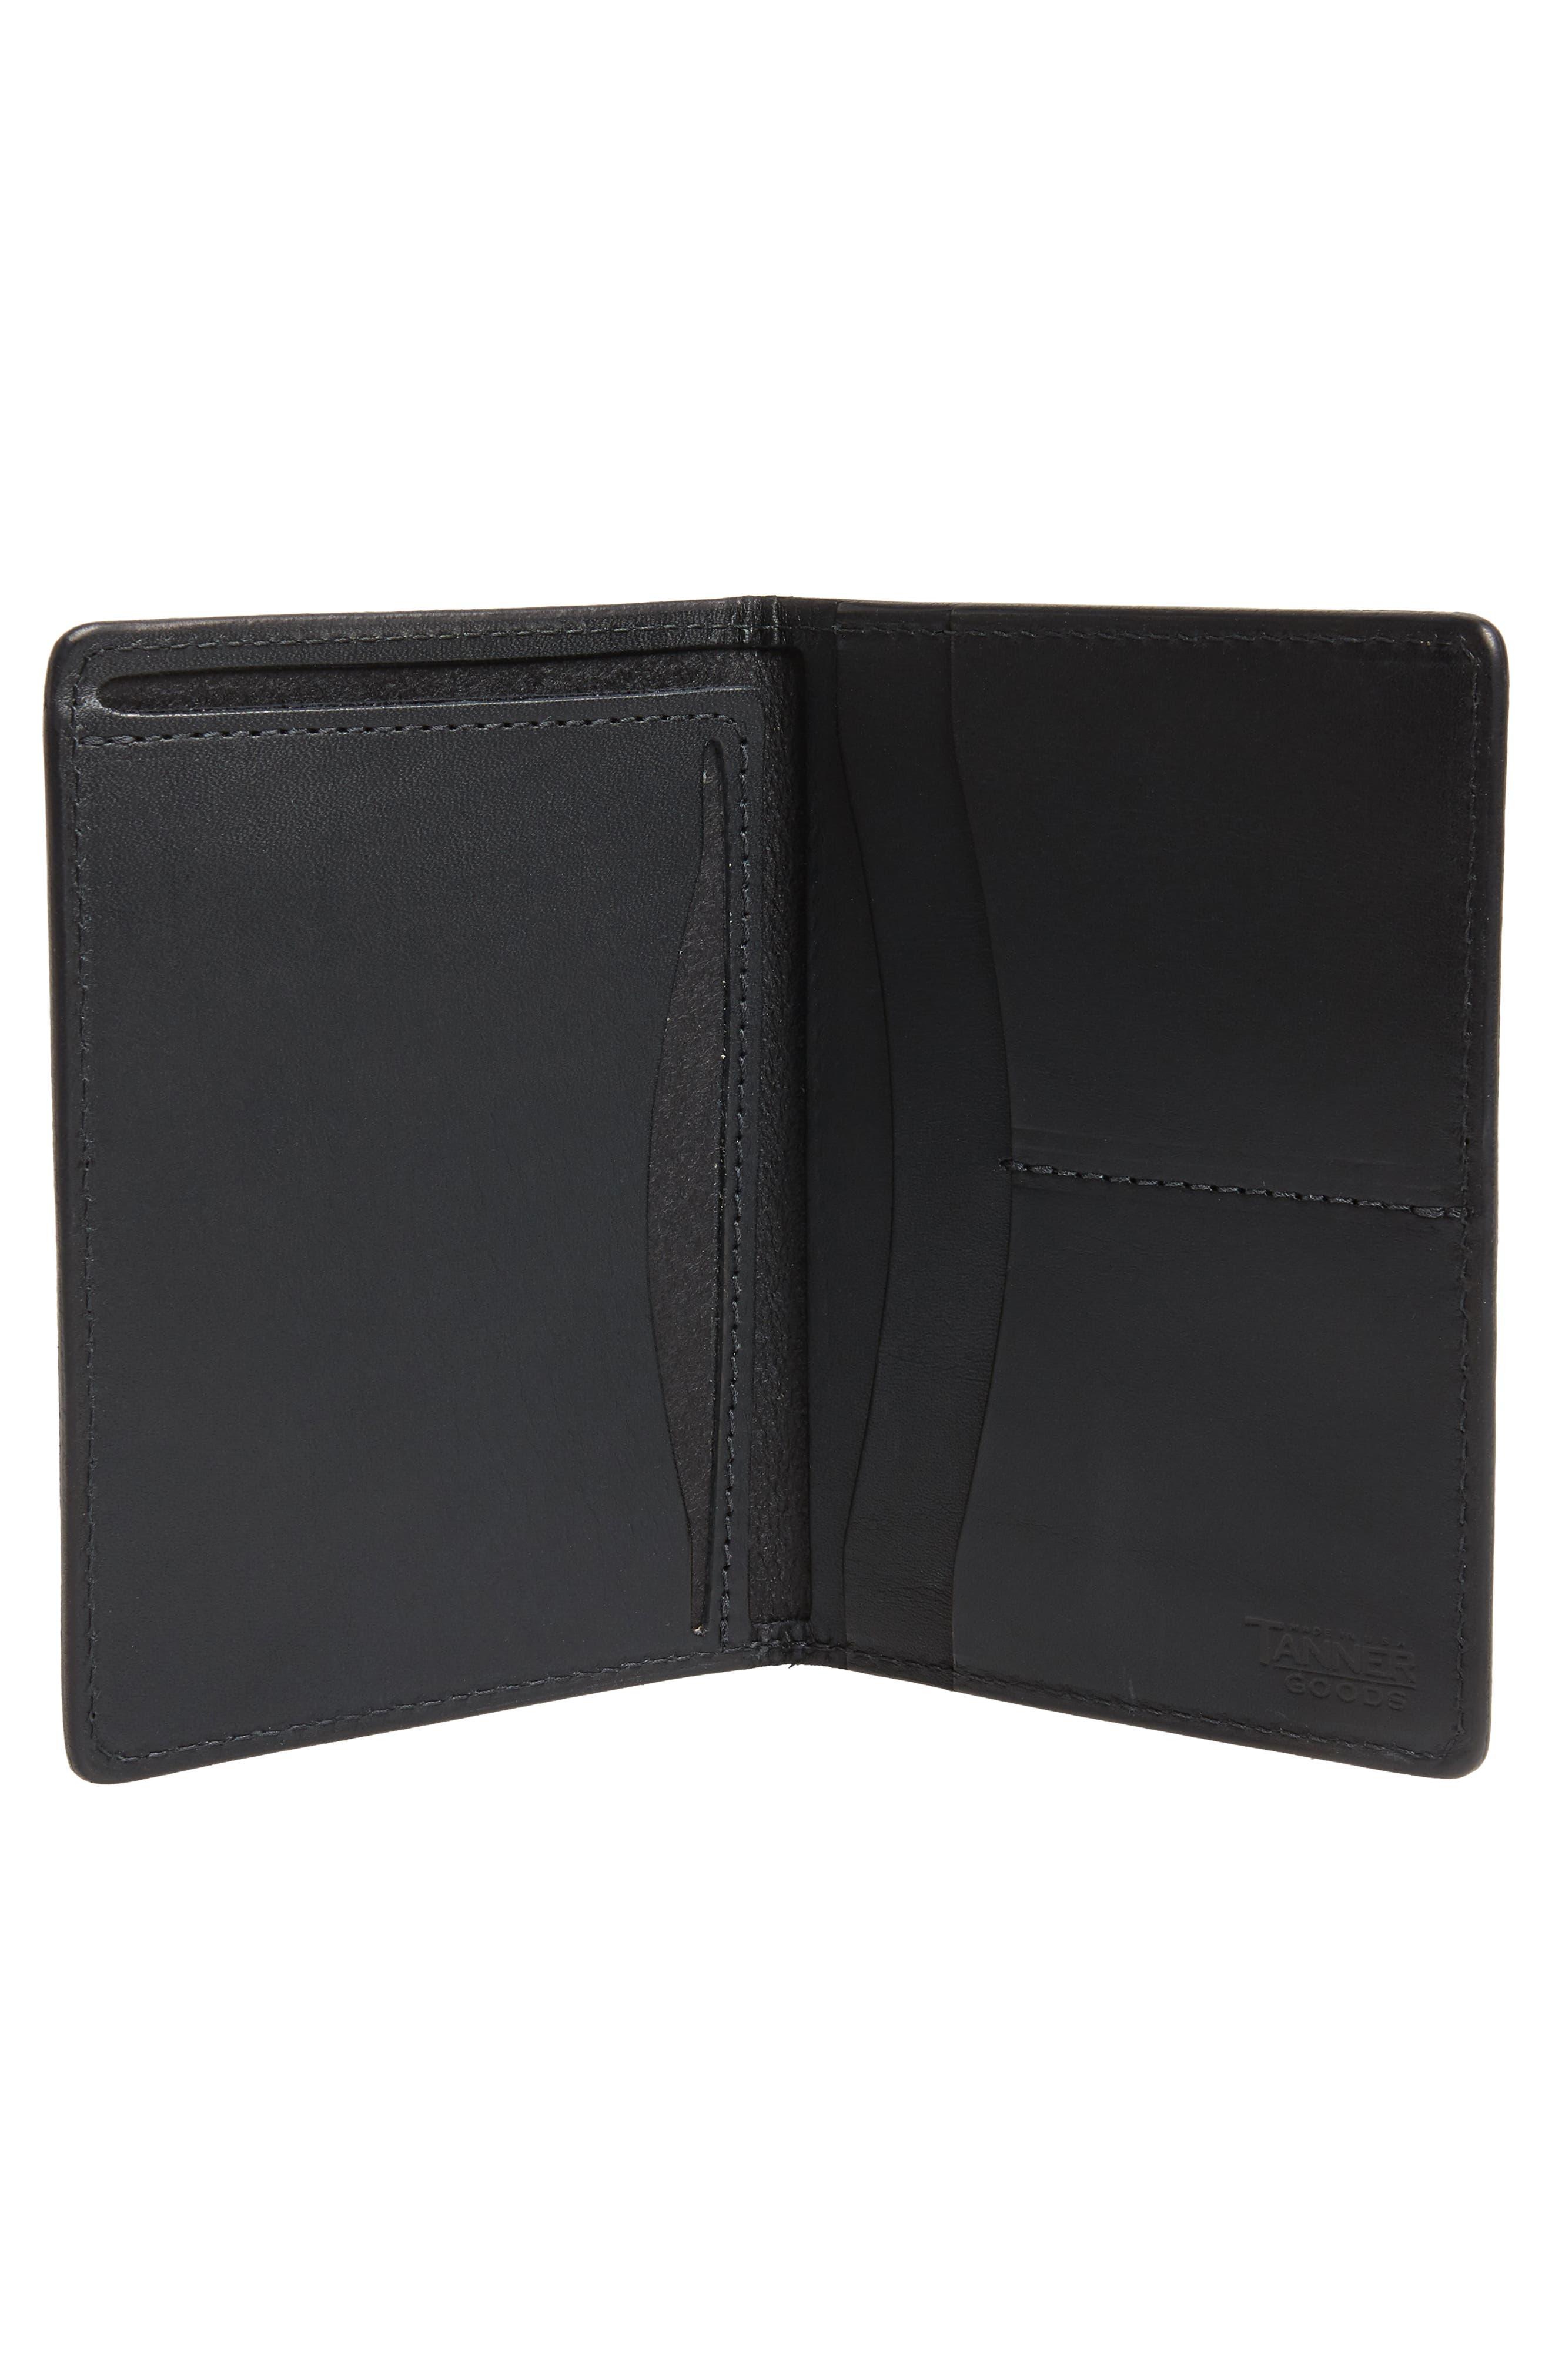 Leather Travel Wallet,                             Alternate thumbnail 3, color,                             Black